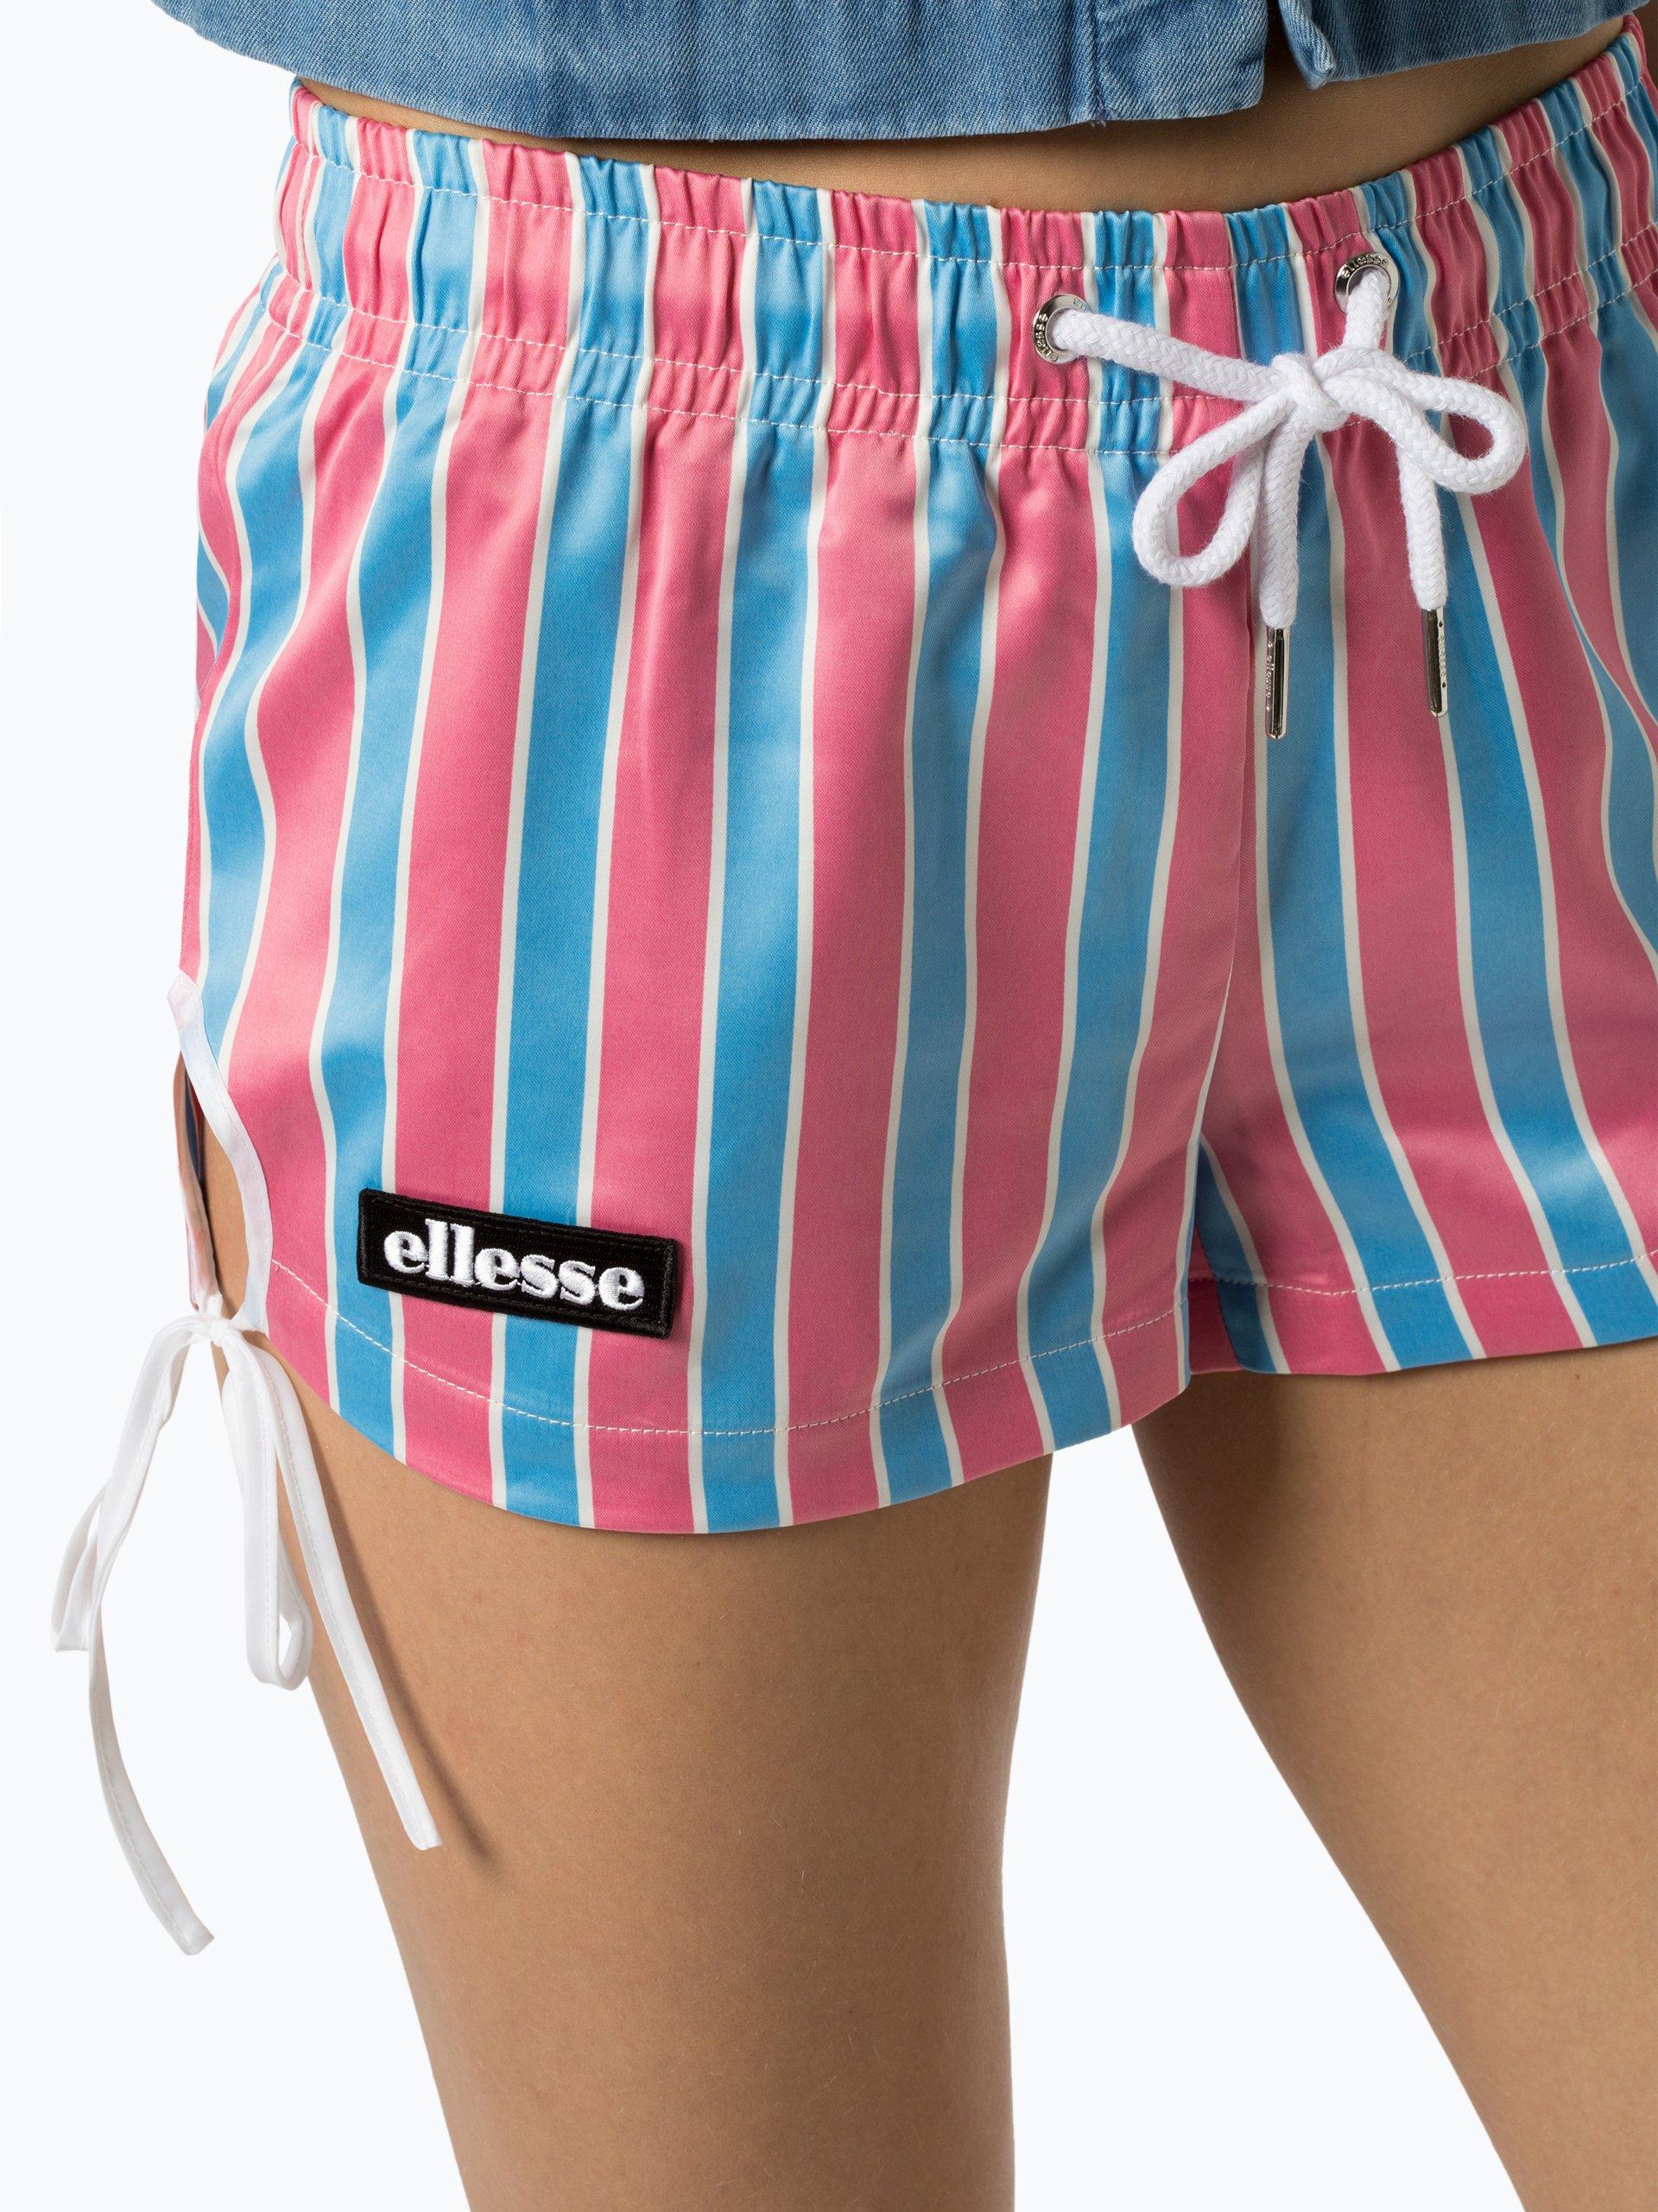 ellesse Damen Shorts - Mindoro